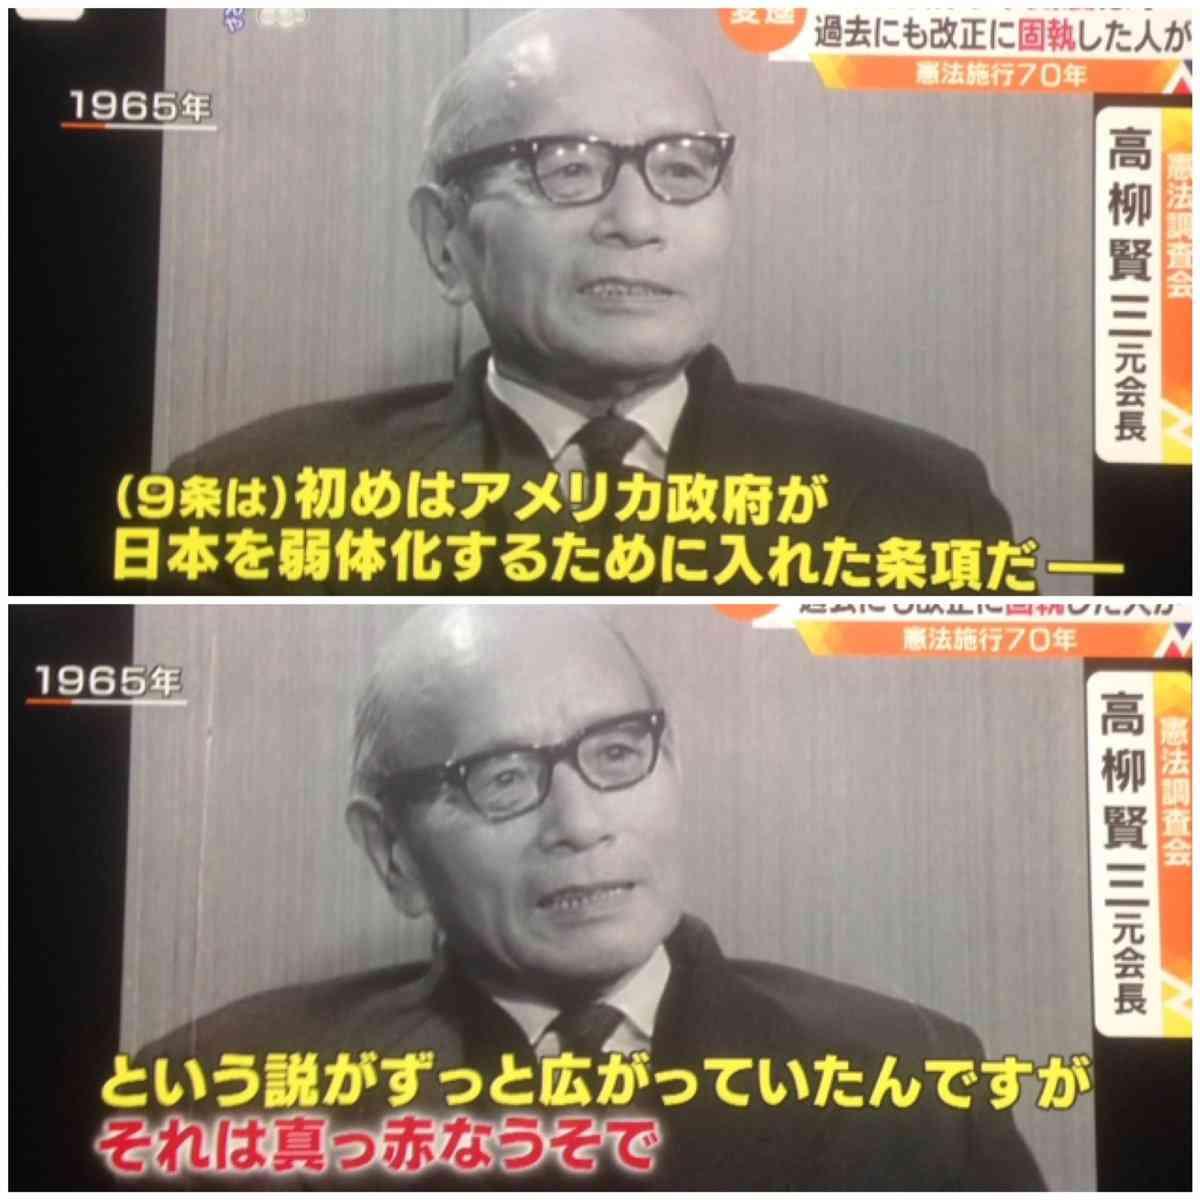 【憲法記念日】憲法改正、賛否が拮抗 施行70年、改憲支持伸びる